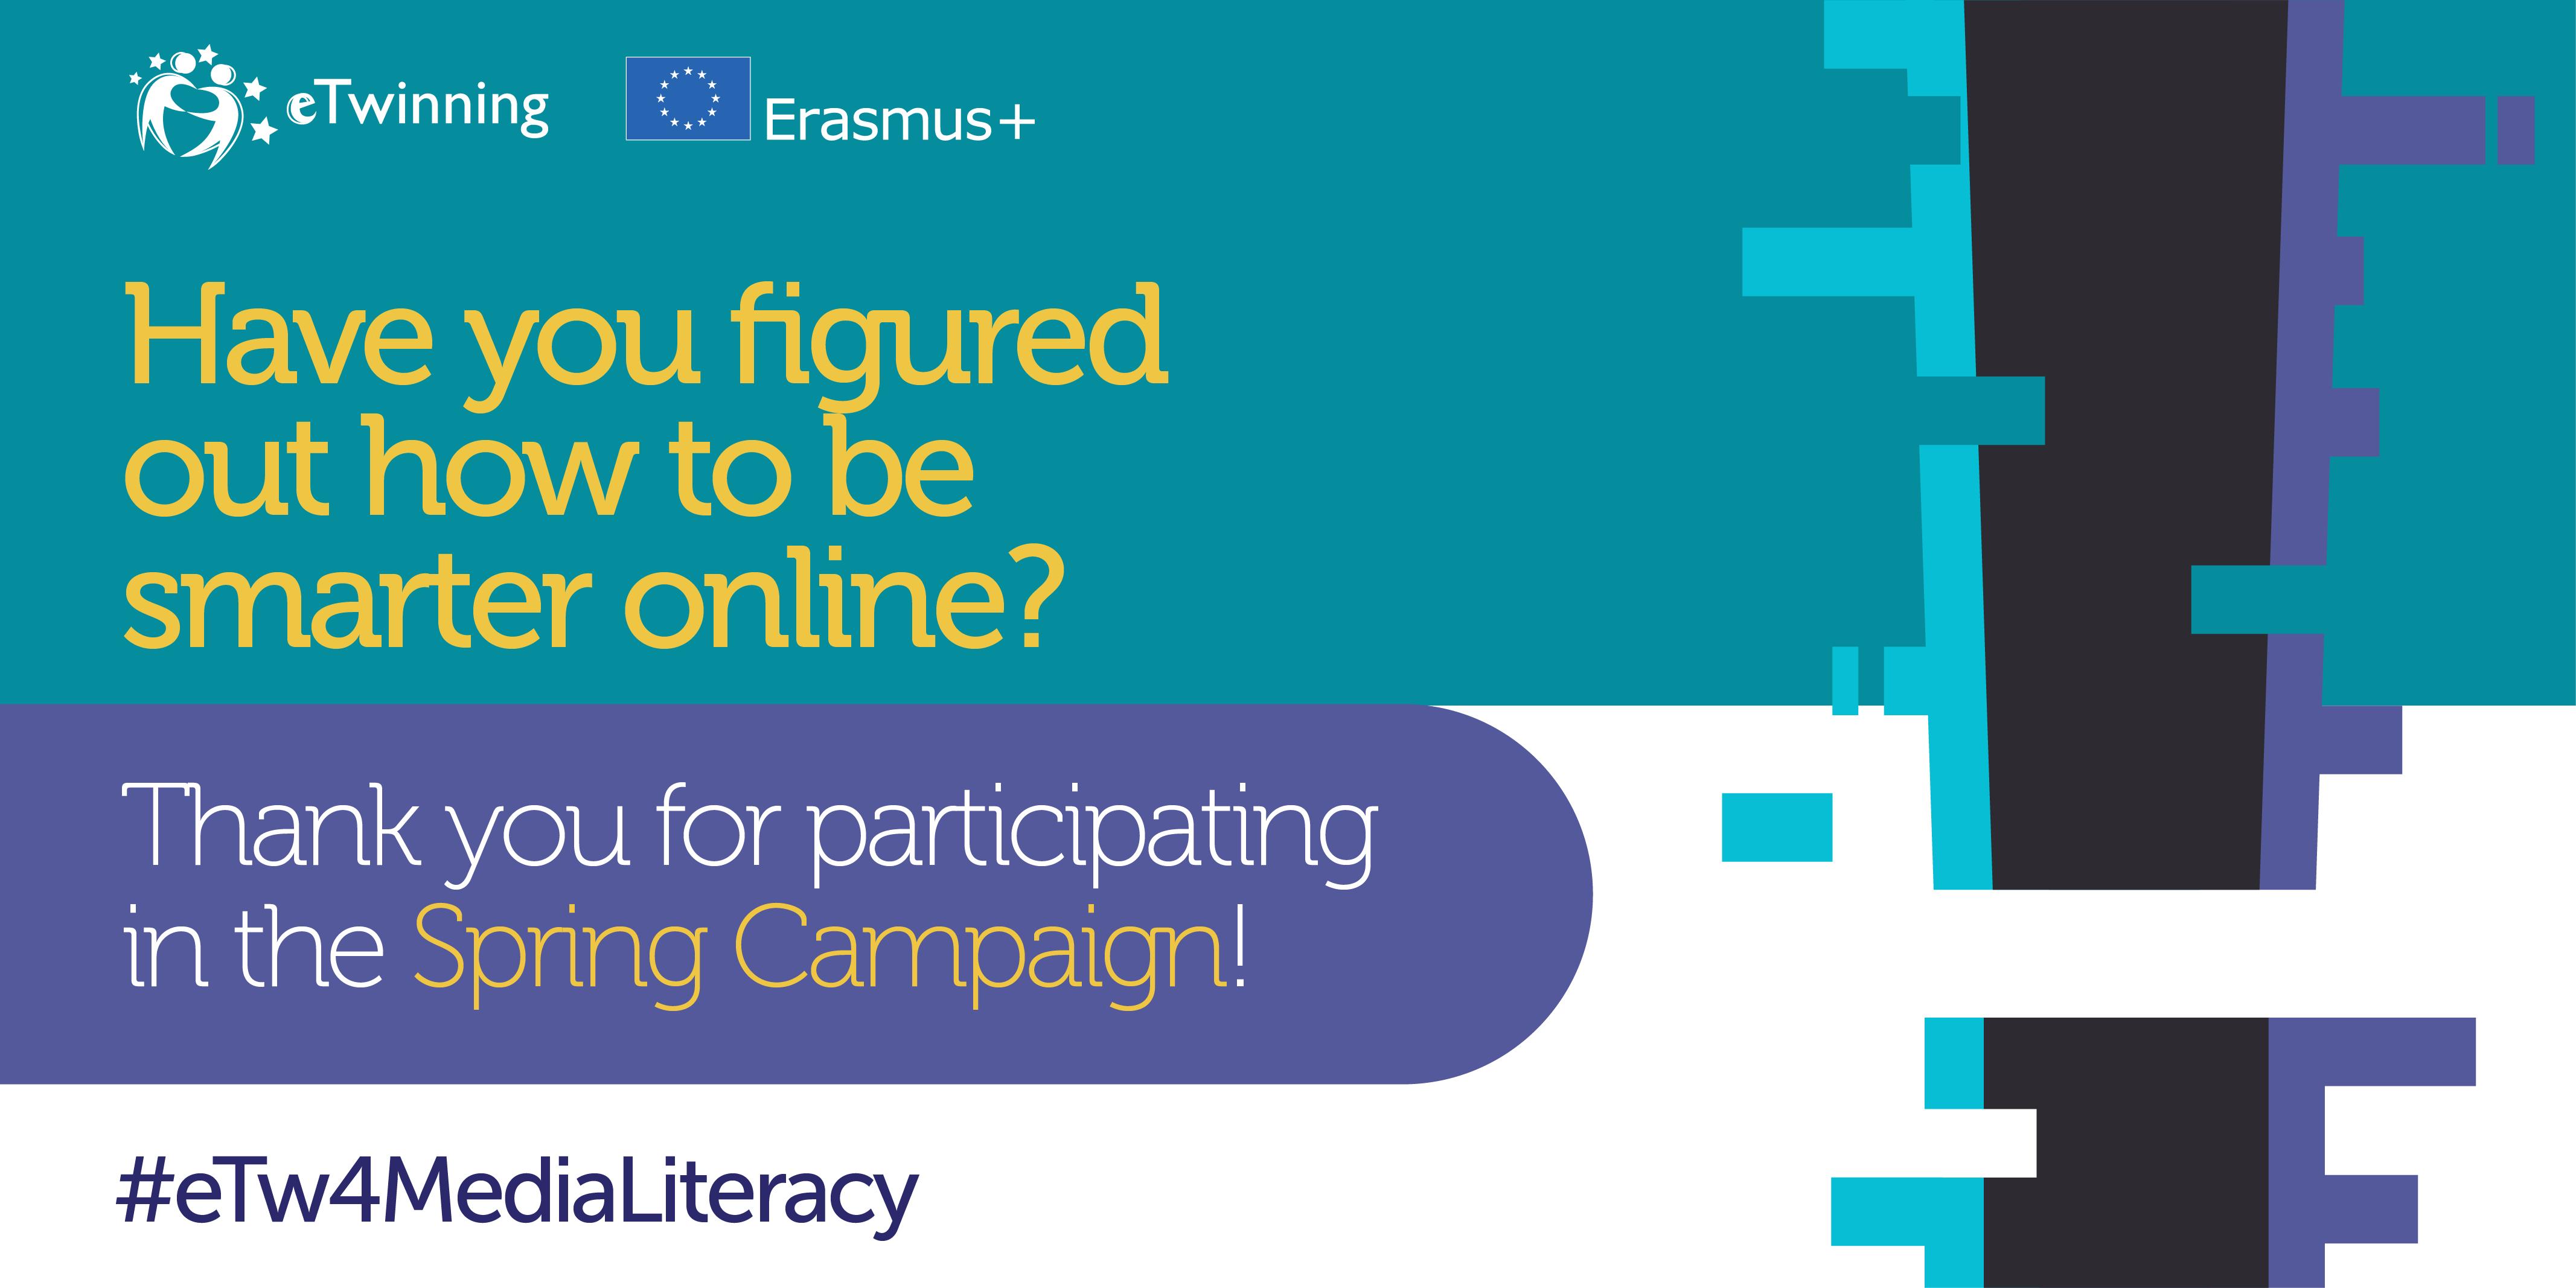 Kako biti pametan online - eTwinningova proljetna kampanja 2021. - Slika